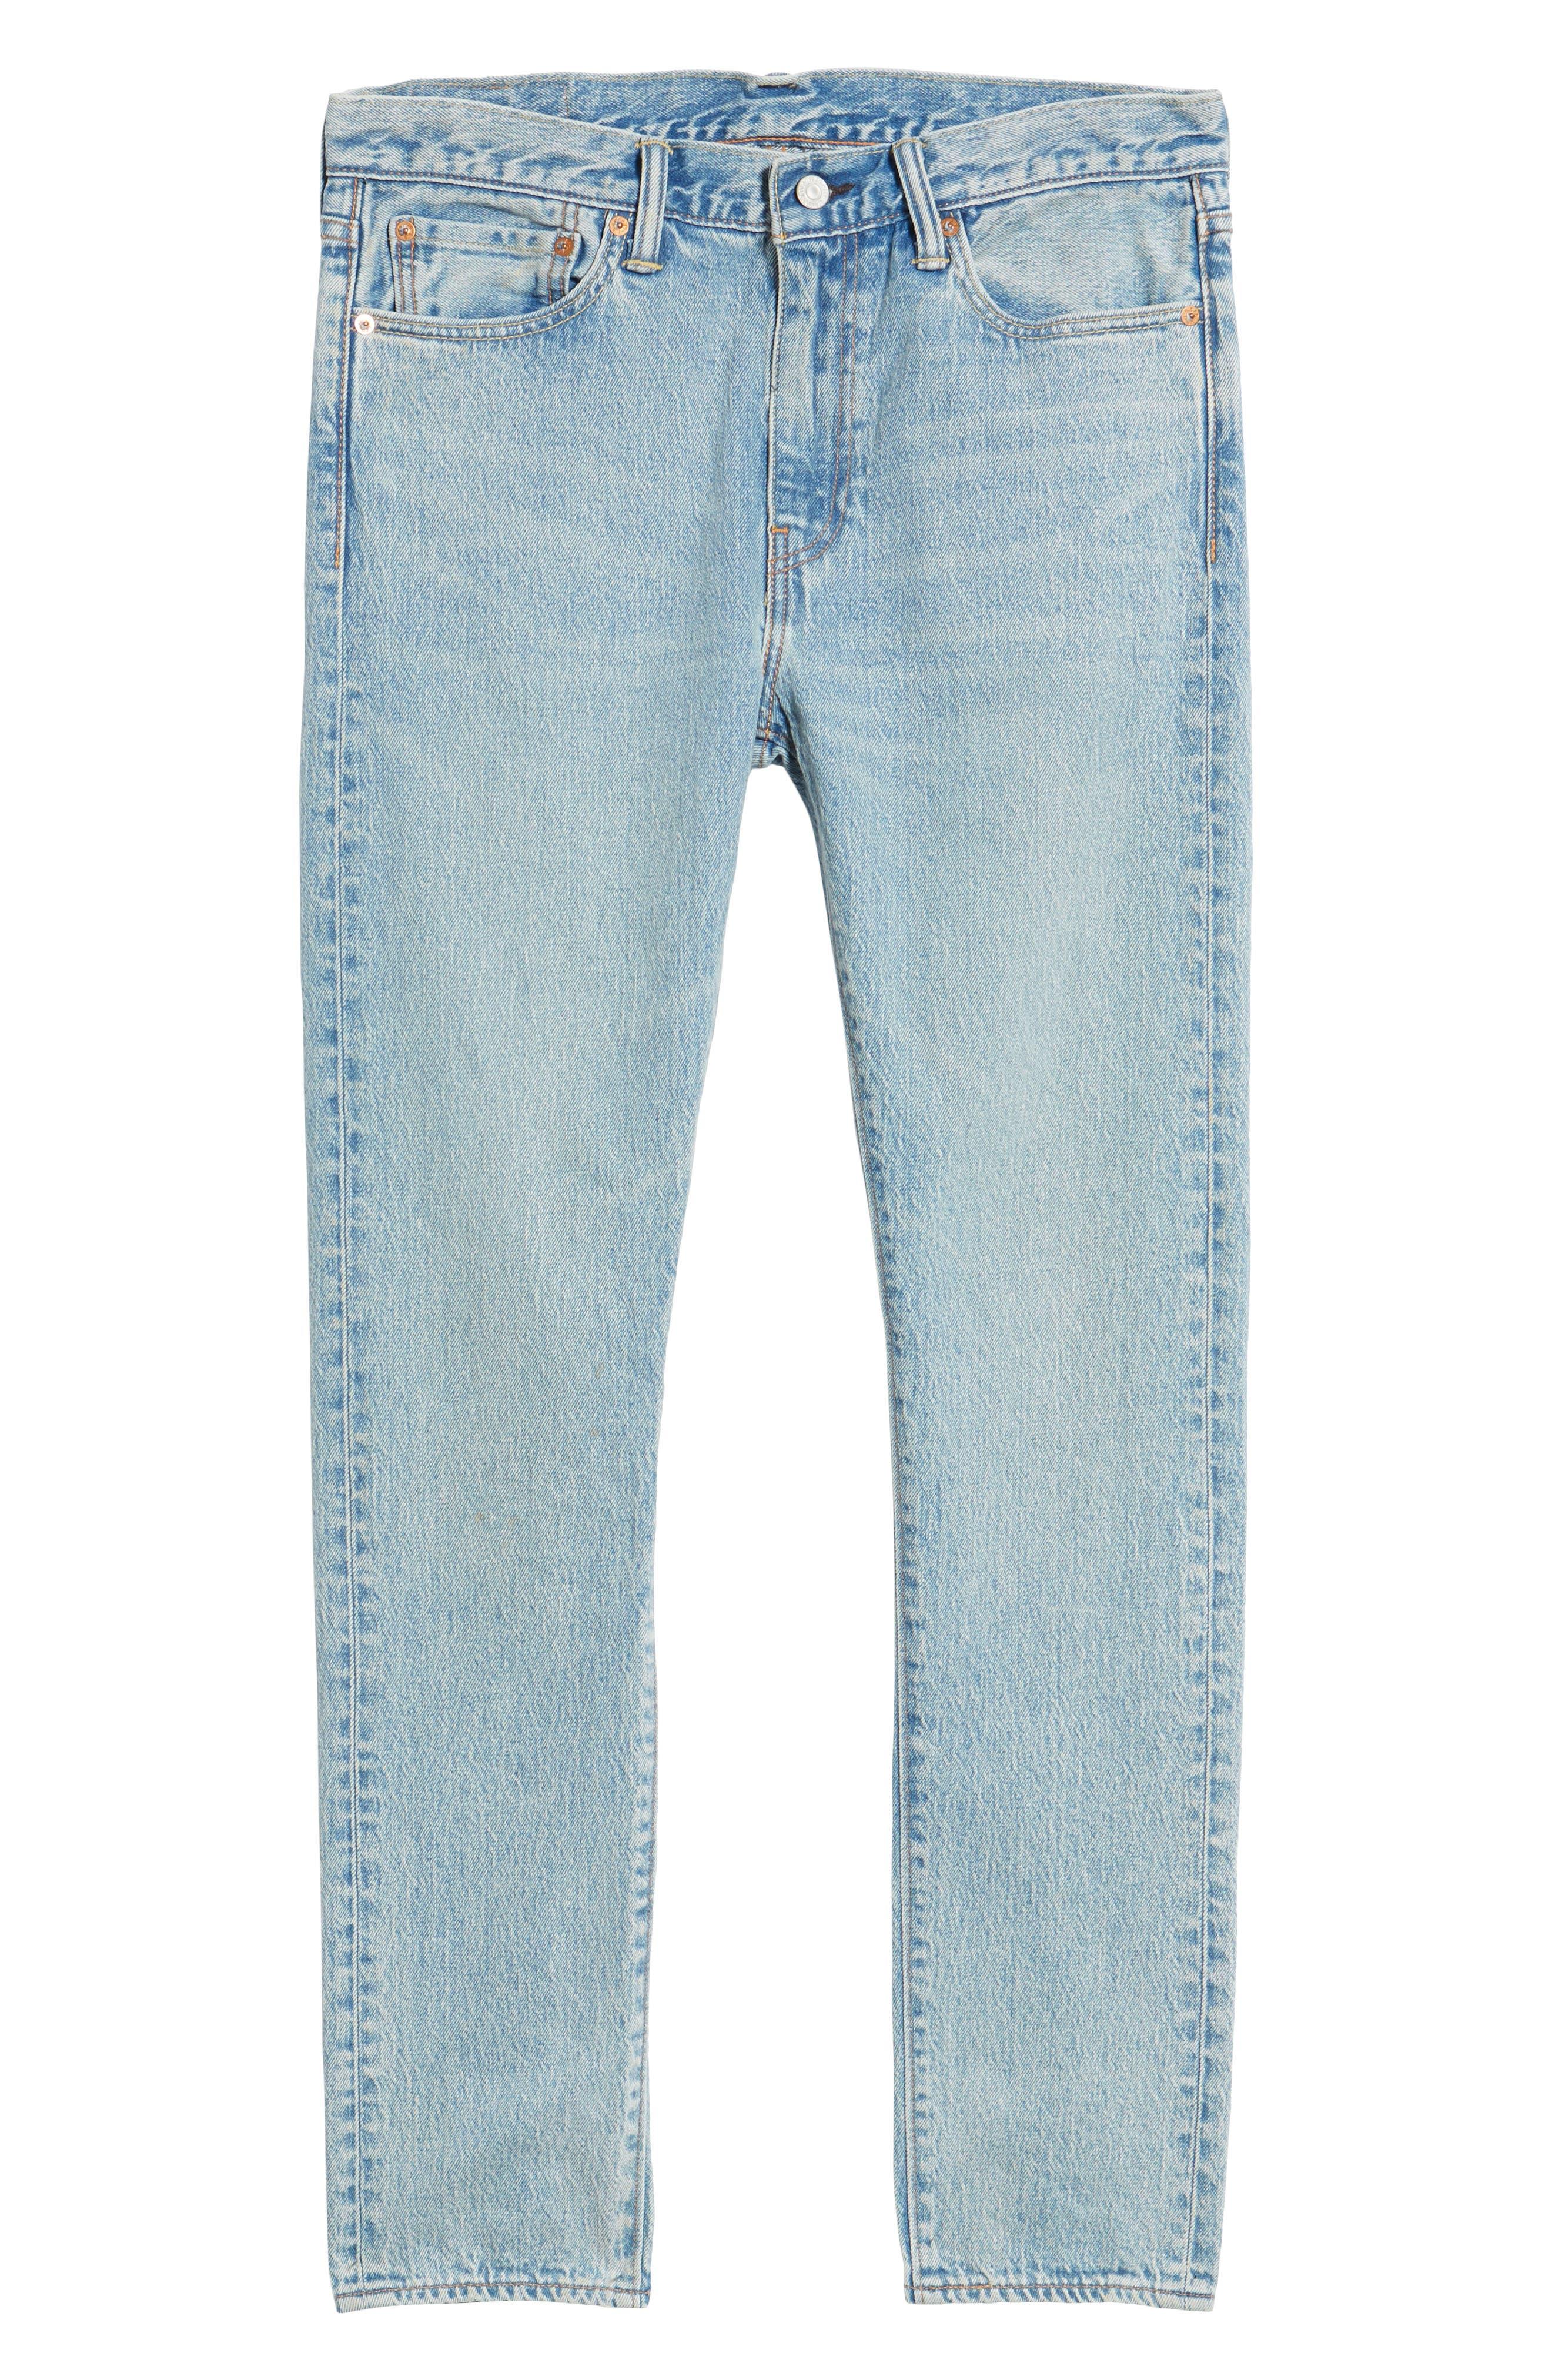 511<sup>™</sup> Slim Fit Jeans,                             Alternate thumbnail 6, color,                             Light Blue Joes